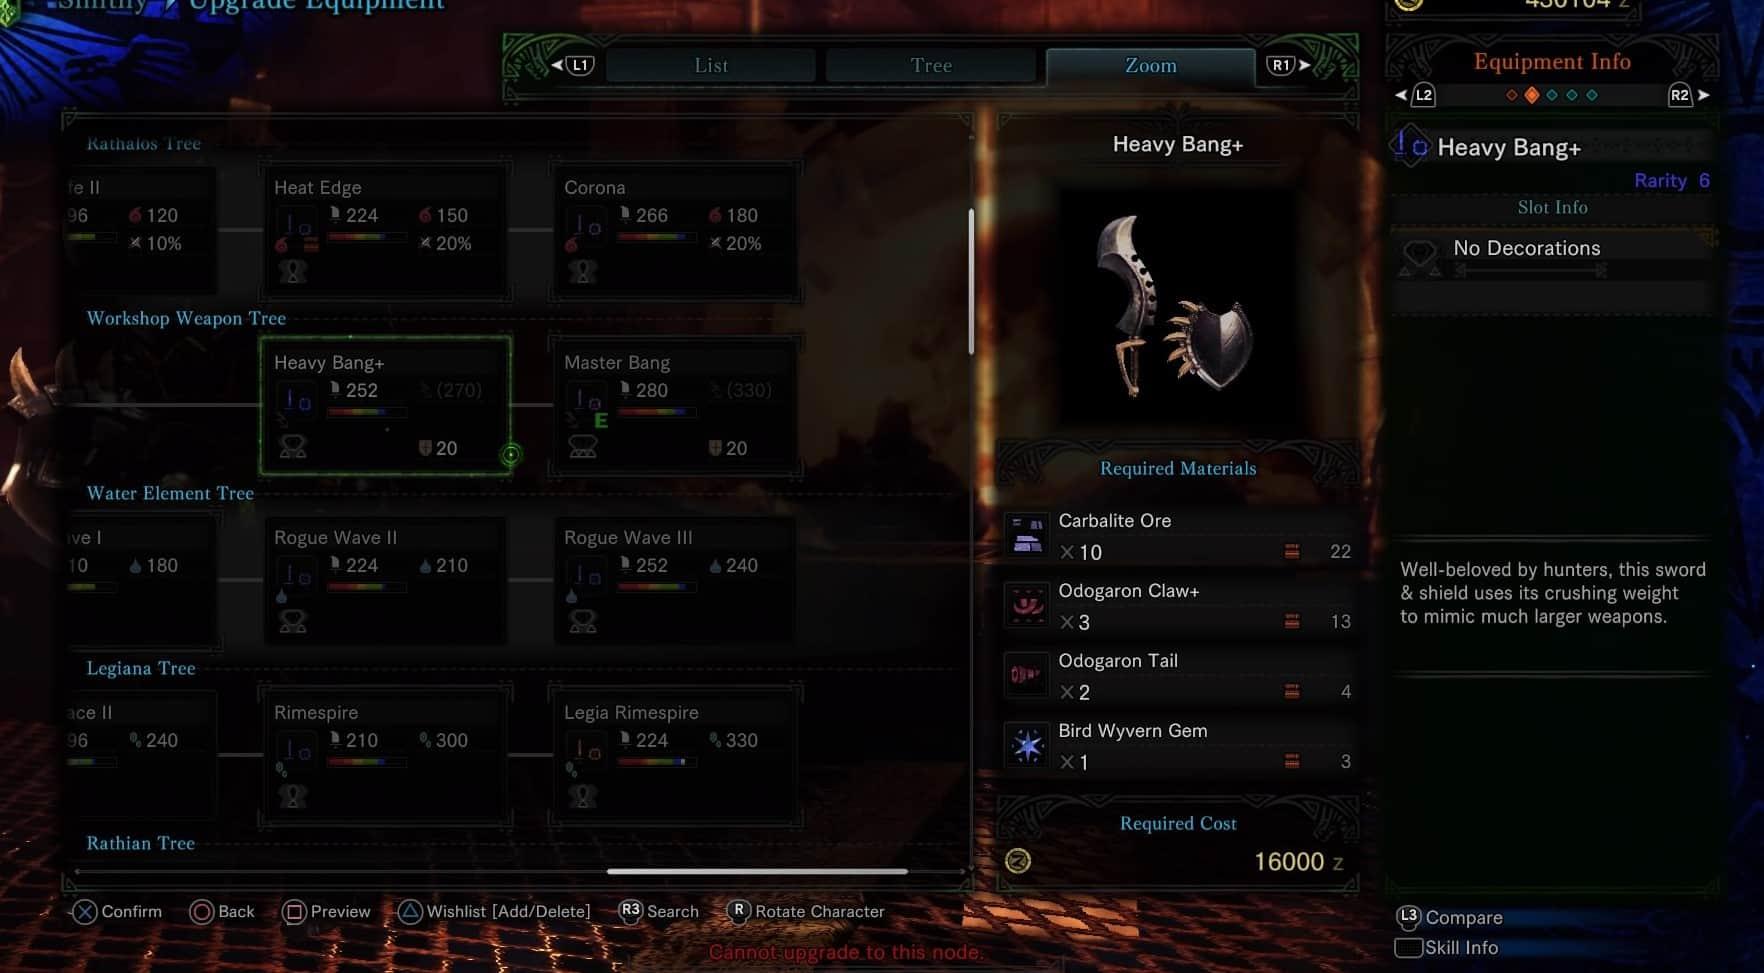 MHW Sword & Shield - Heavy Bang